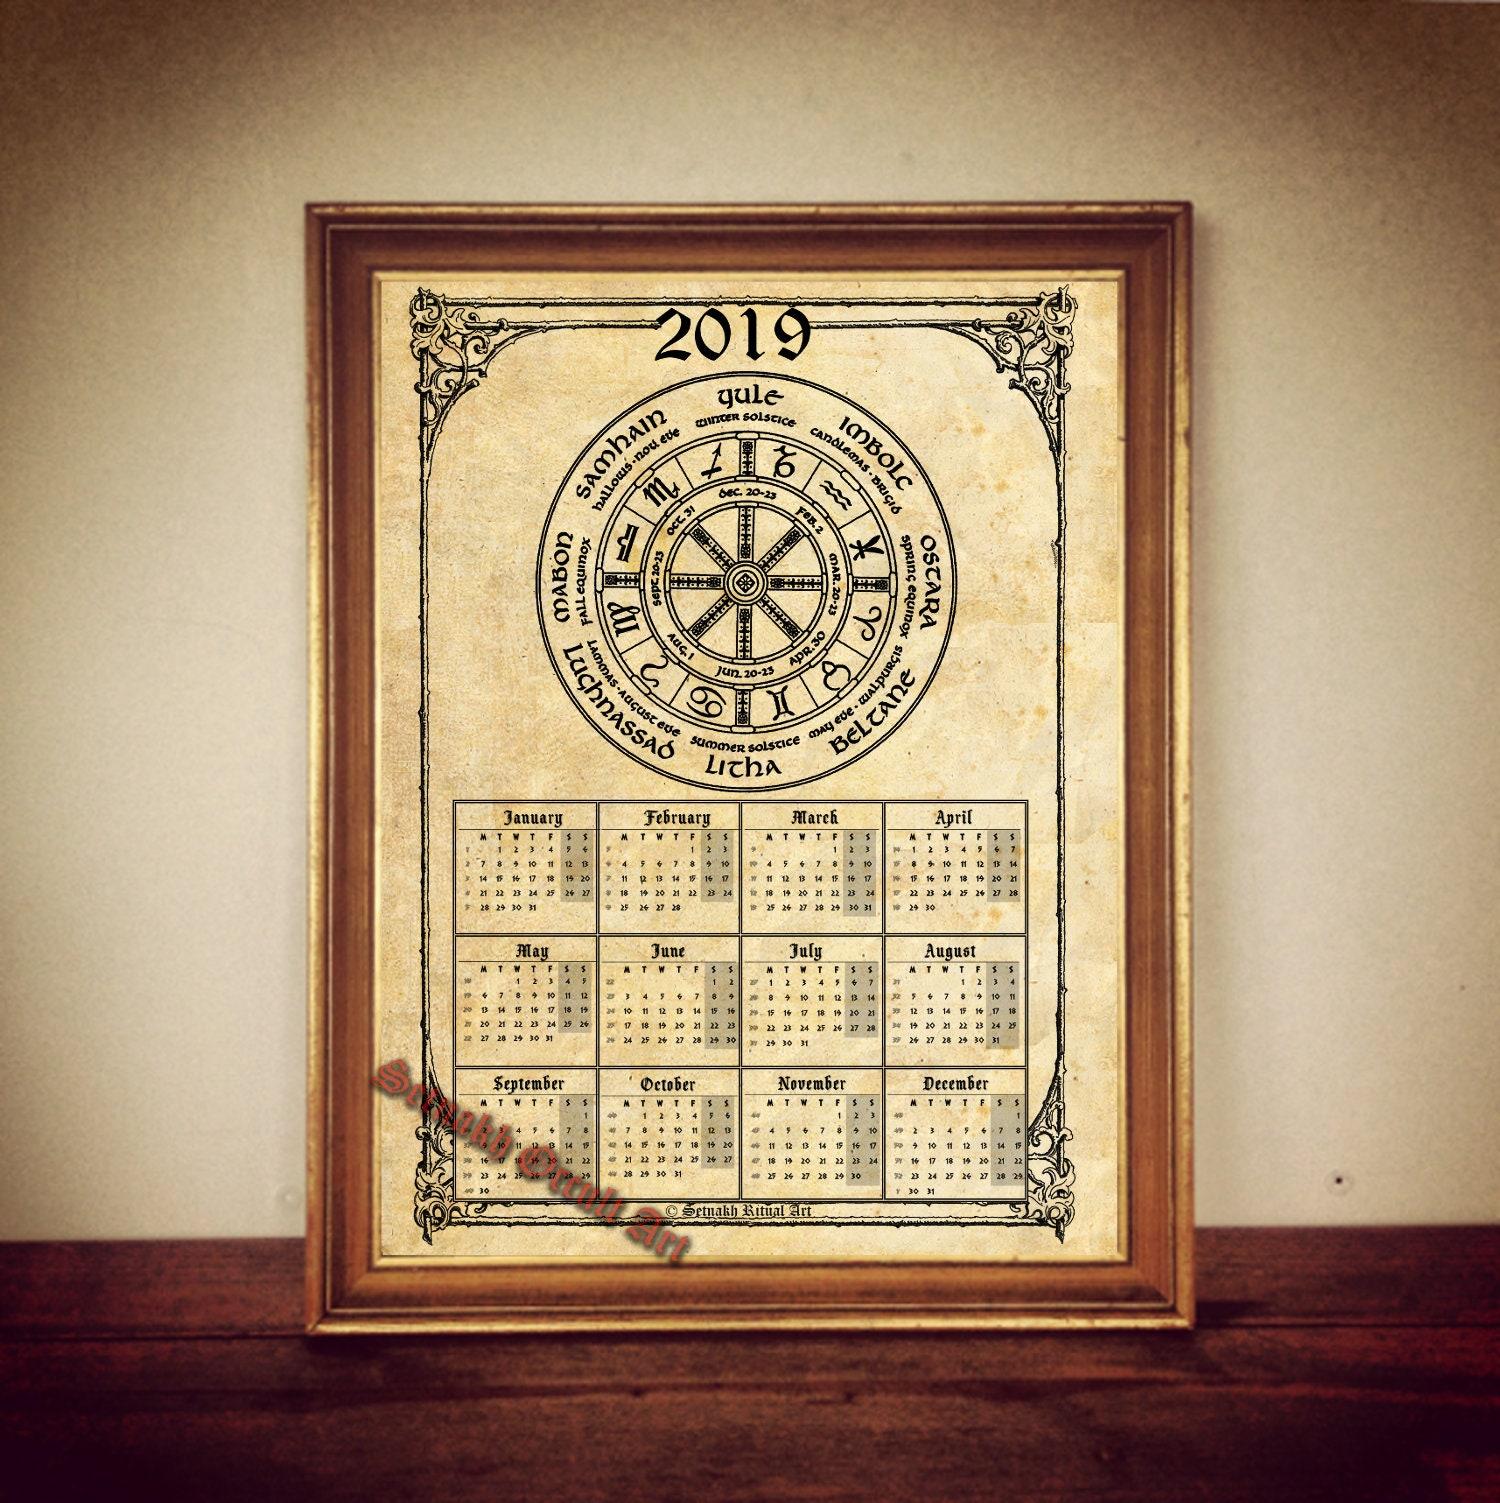 Pagan Calendar.2019 Calendar With Wheel Of The Year Occult Calendar Pagan Calendar Print Magic Calendar Occult Print Magic Decor Magic Print